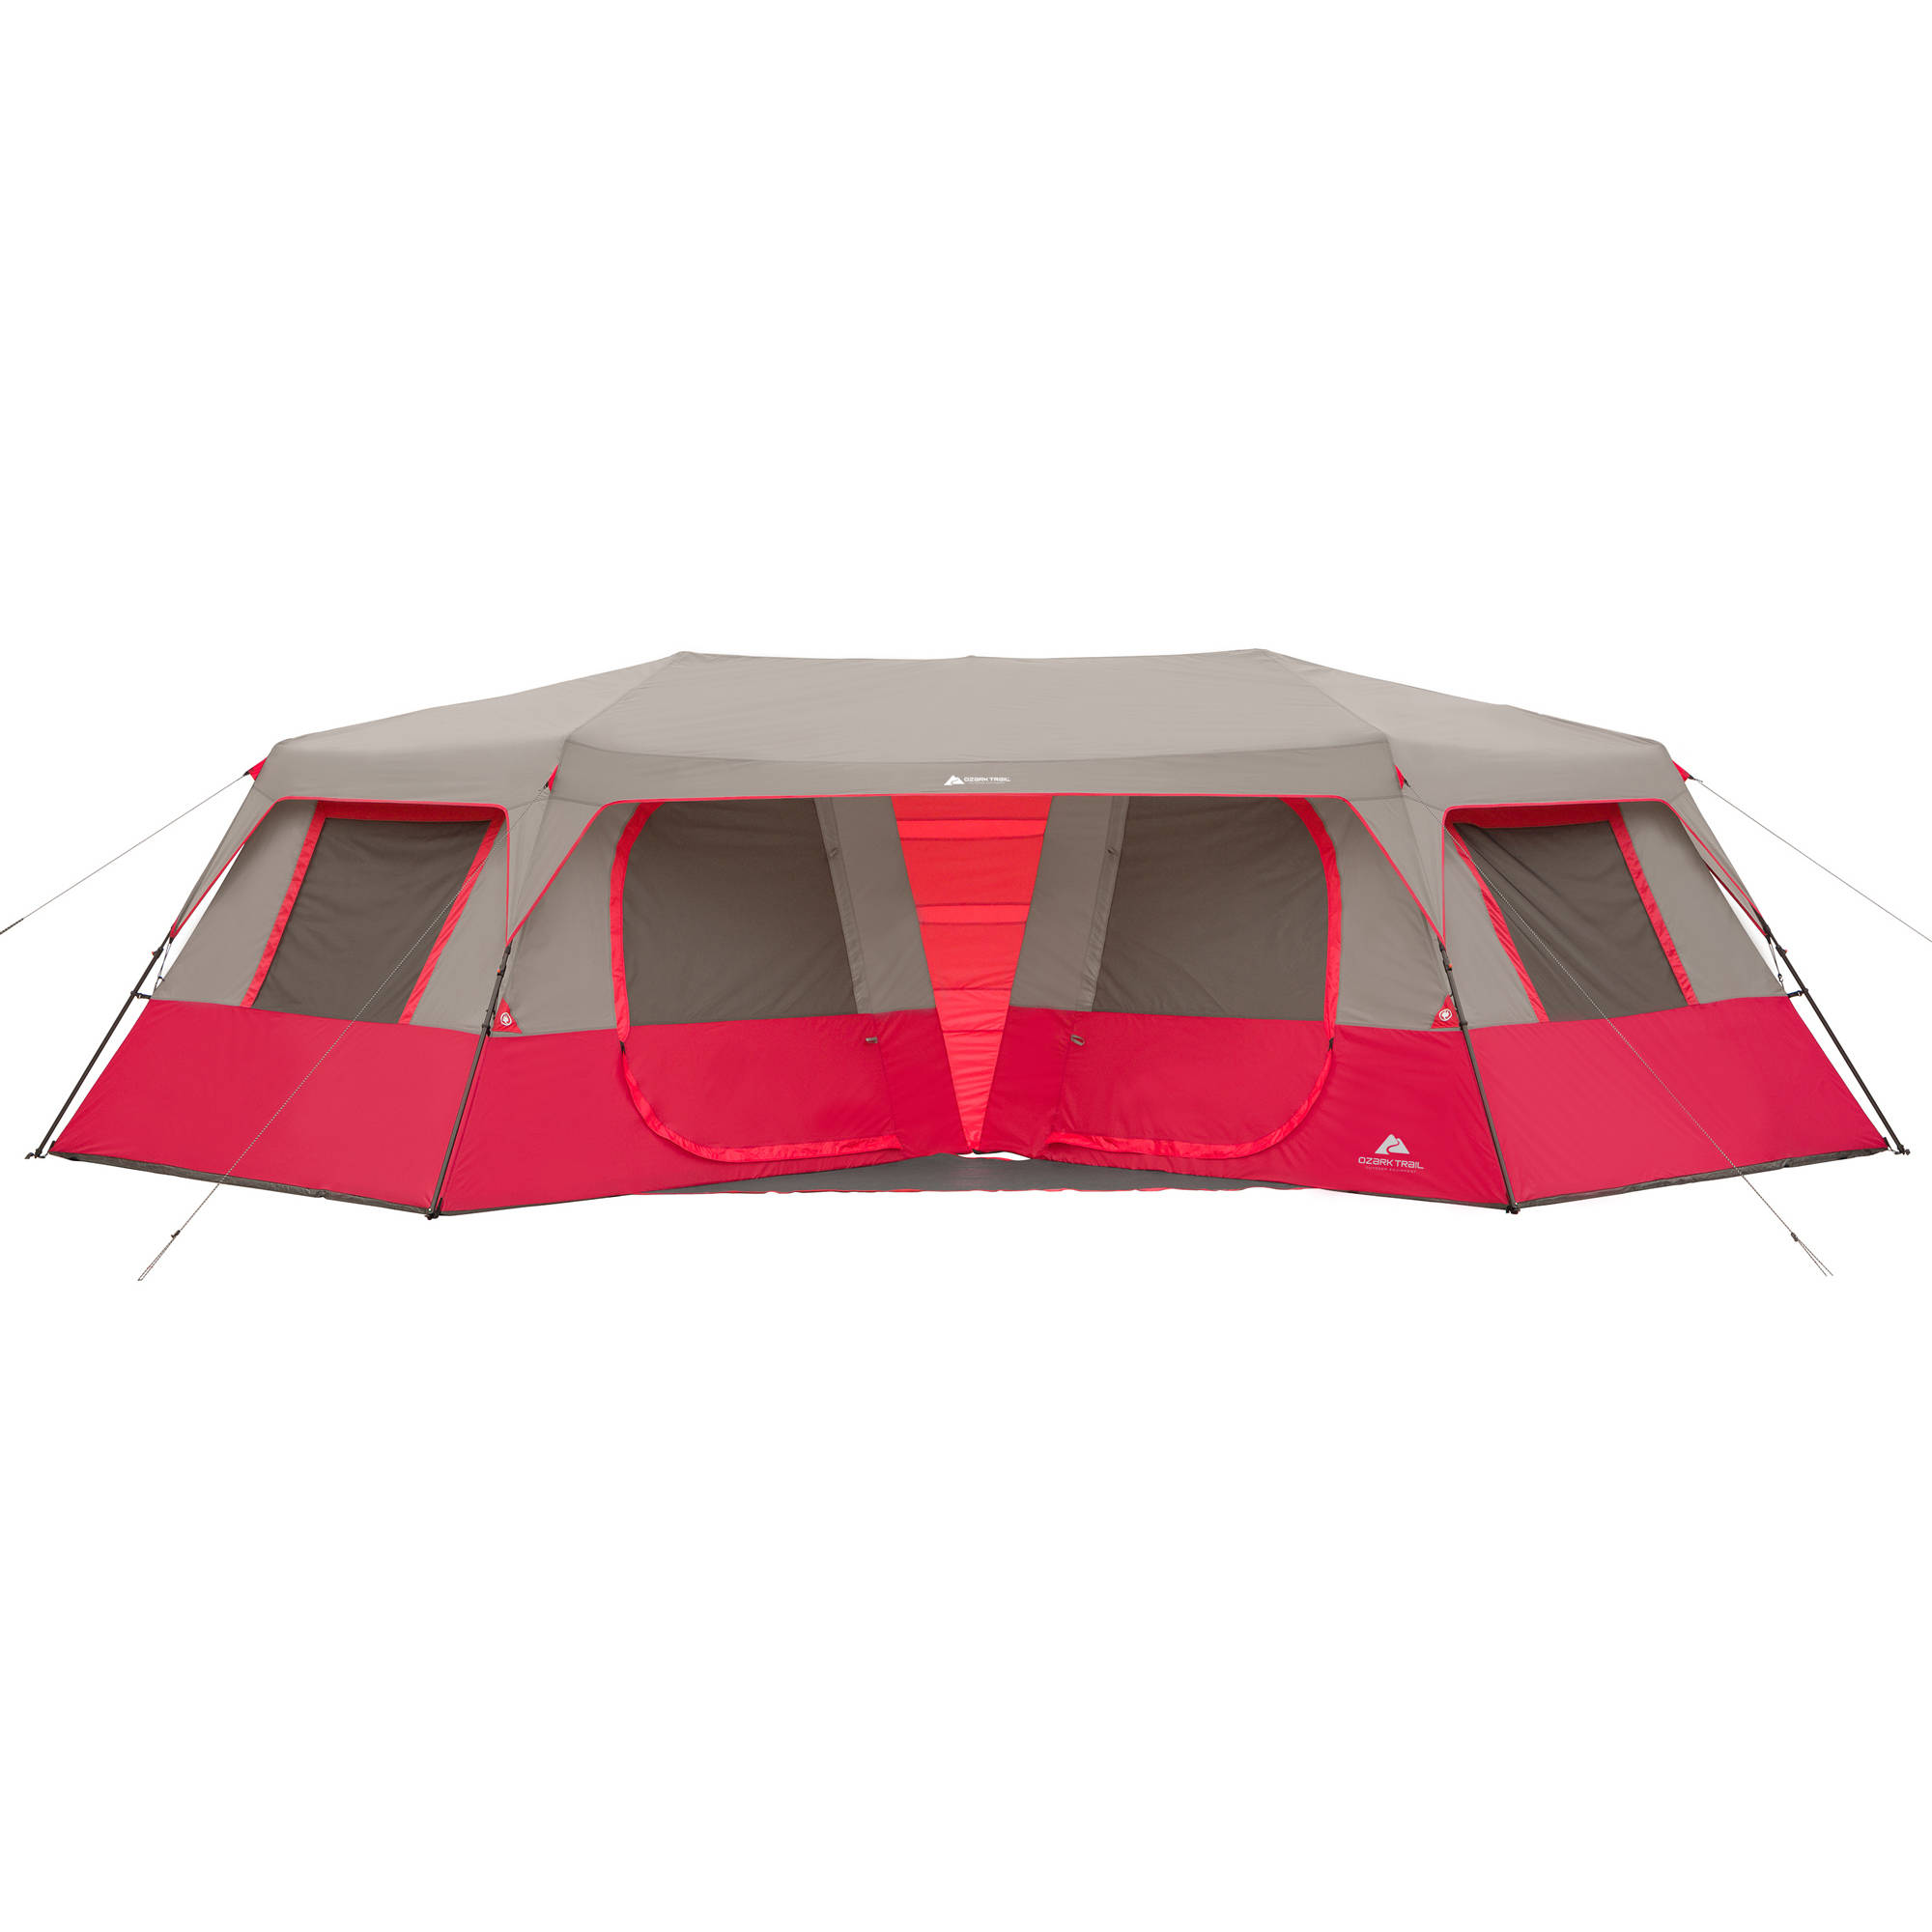 10 Person Instant Cabin Tent : New quality ozark trail quot instant double villa